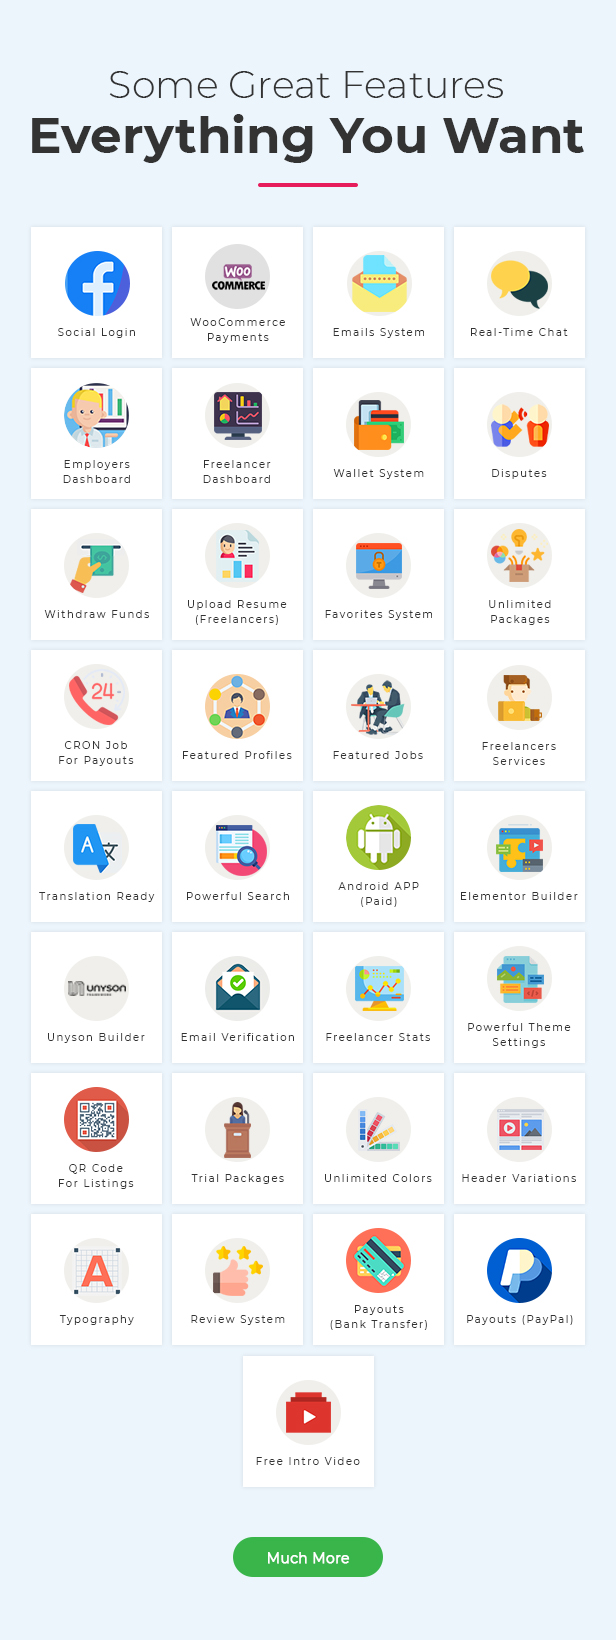 Workreap - Freelance Marketplace and Directory WordPress Theme - 18